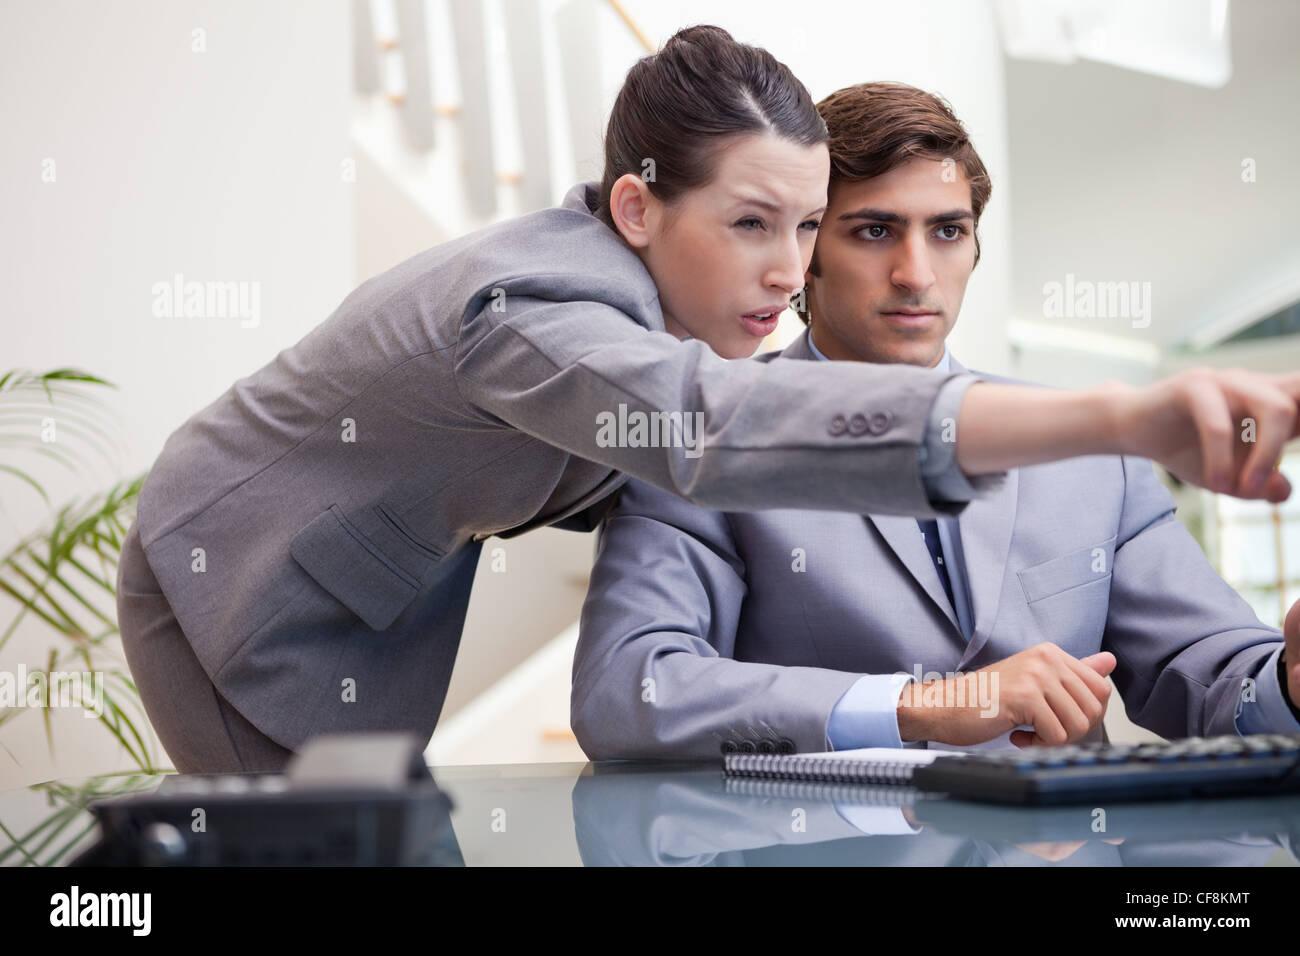 Businesswoman explaining computer program to colleague - Stock Image